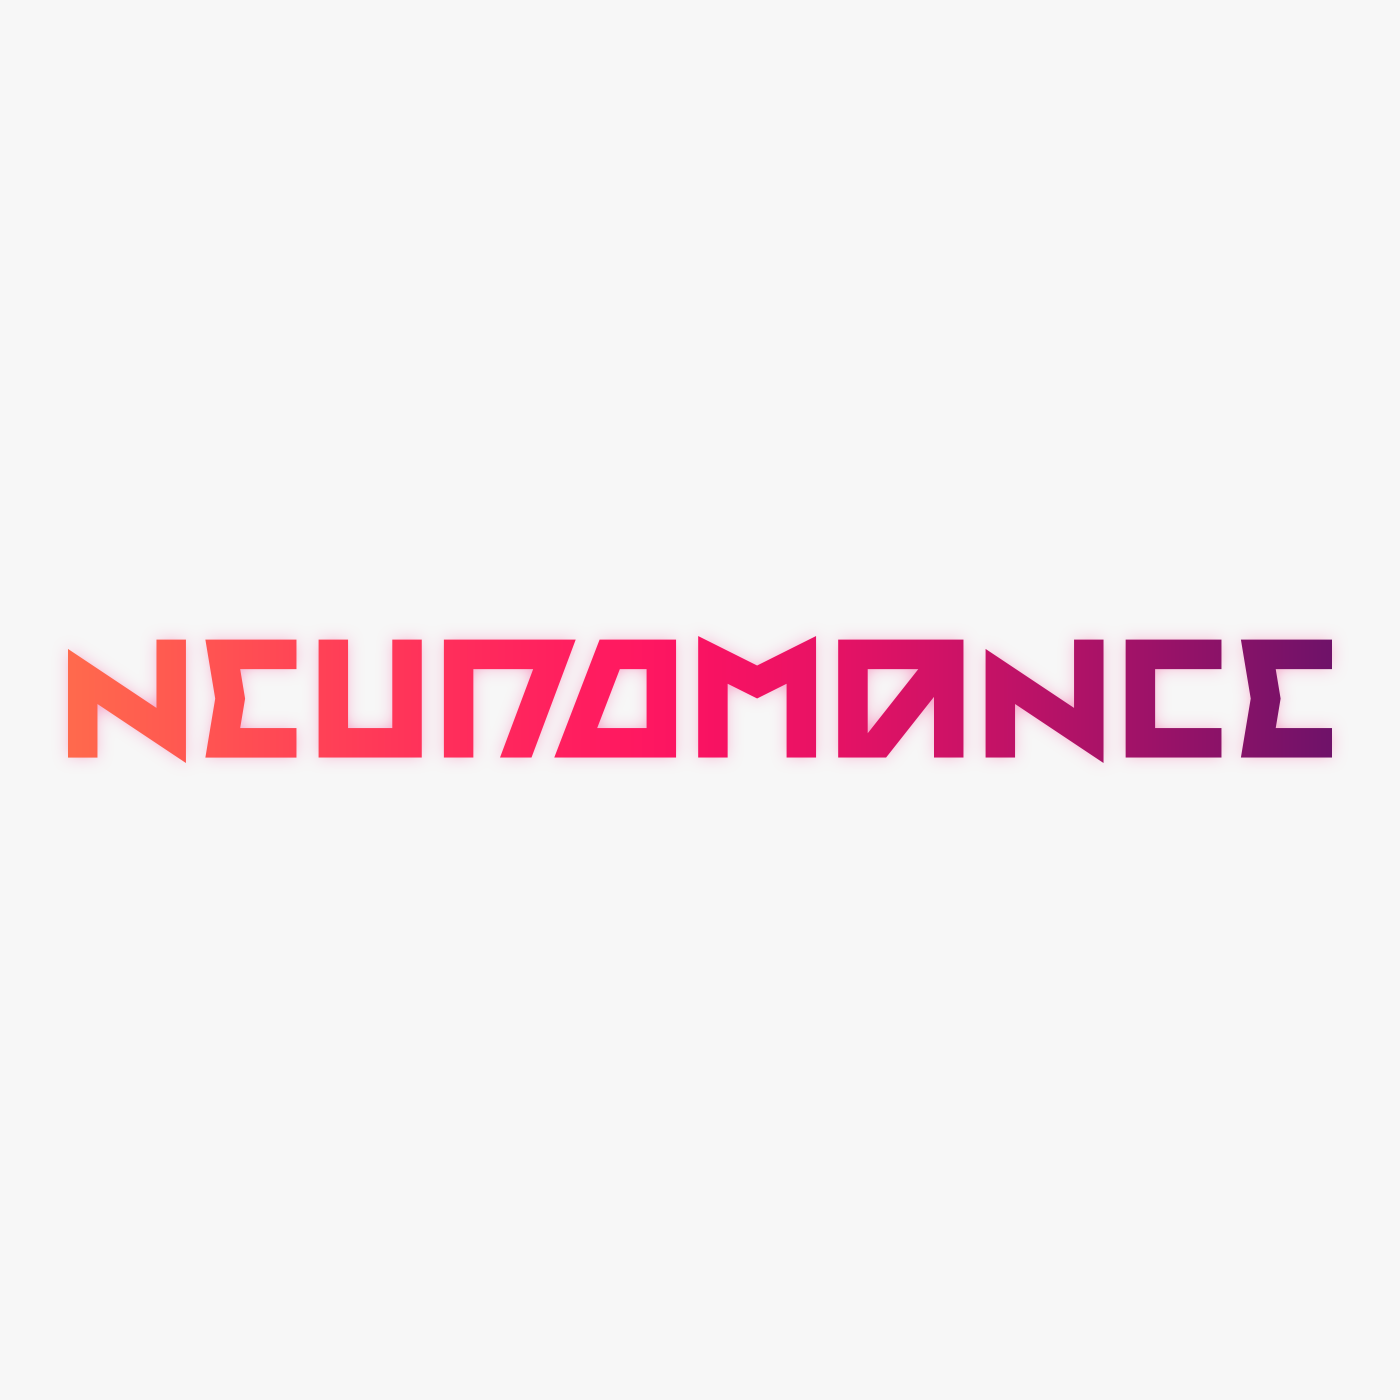 NEUROMANCE